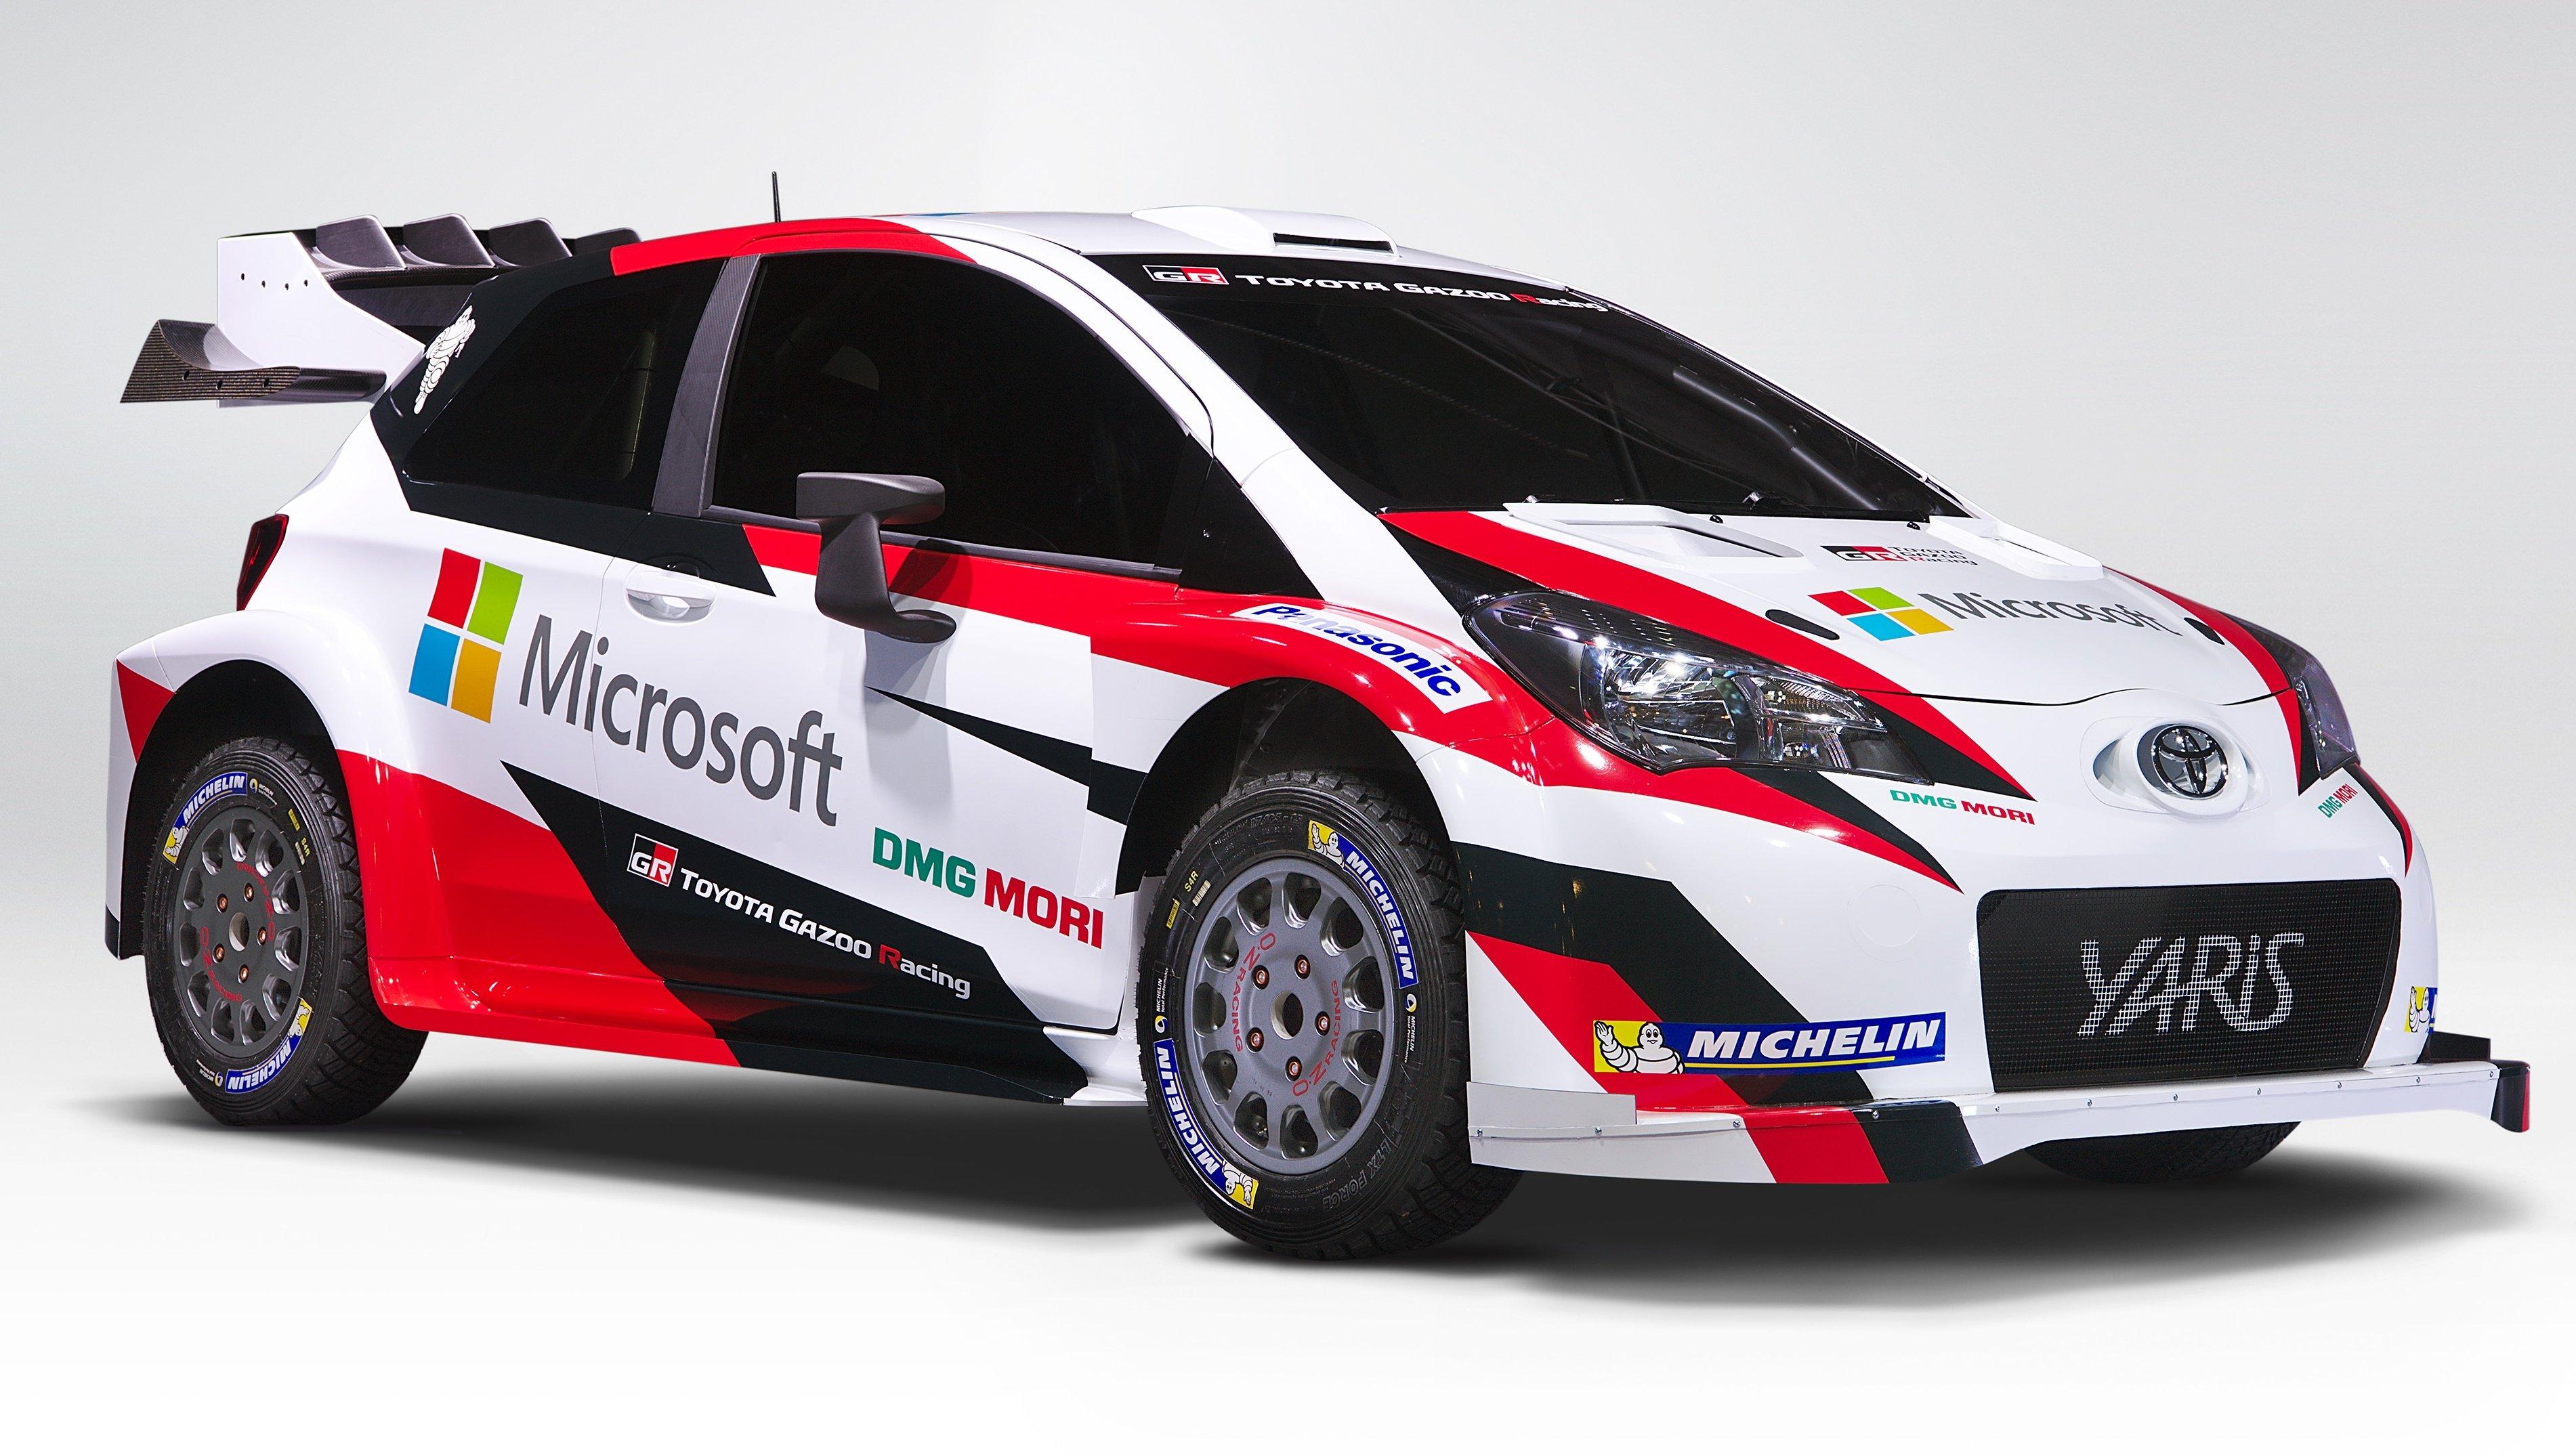 2017 Toyota Yaris WRC unveiled – Microsoft as partner Image 557654